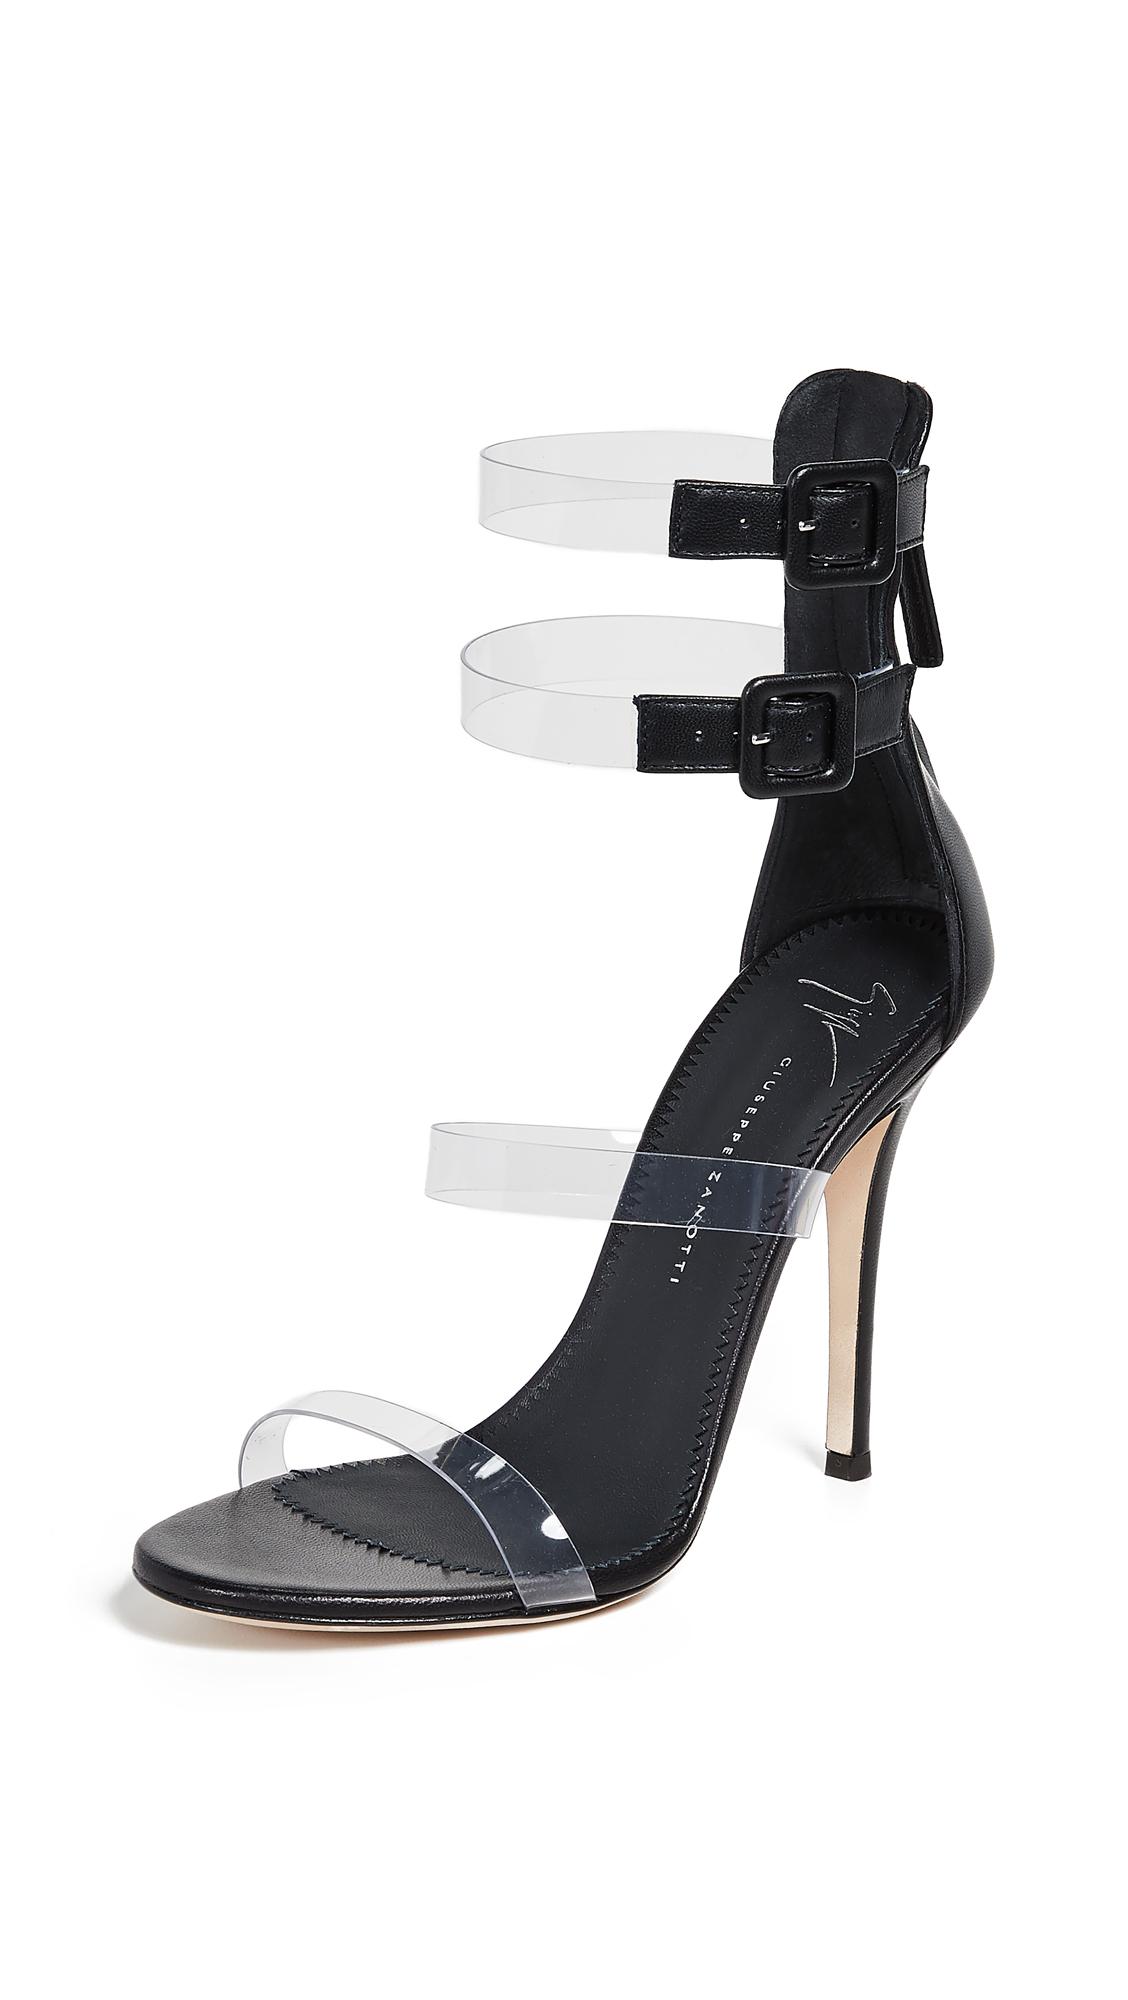 Giuseppe Zanotti Alien 115 Sandals - Transparente